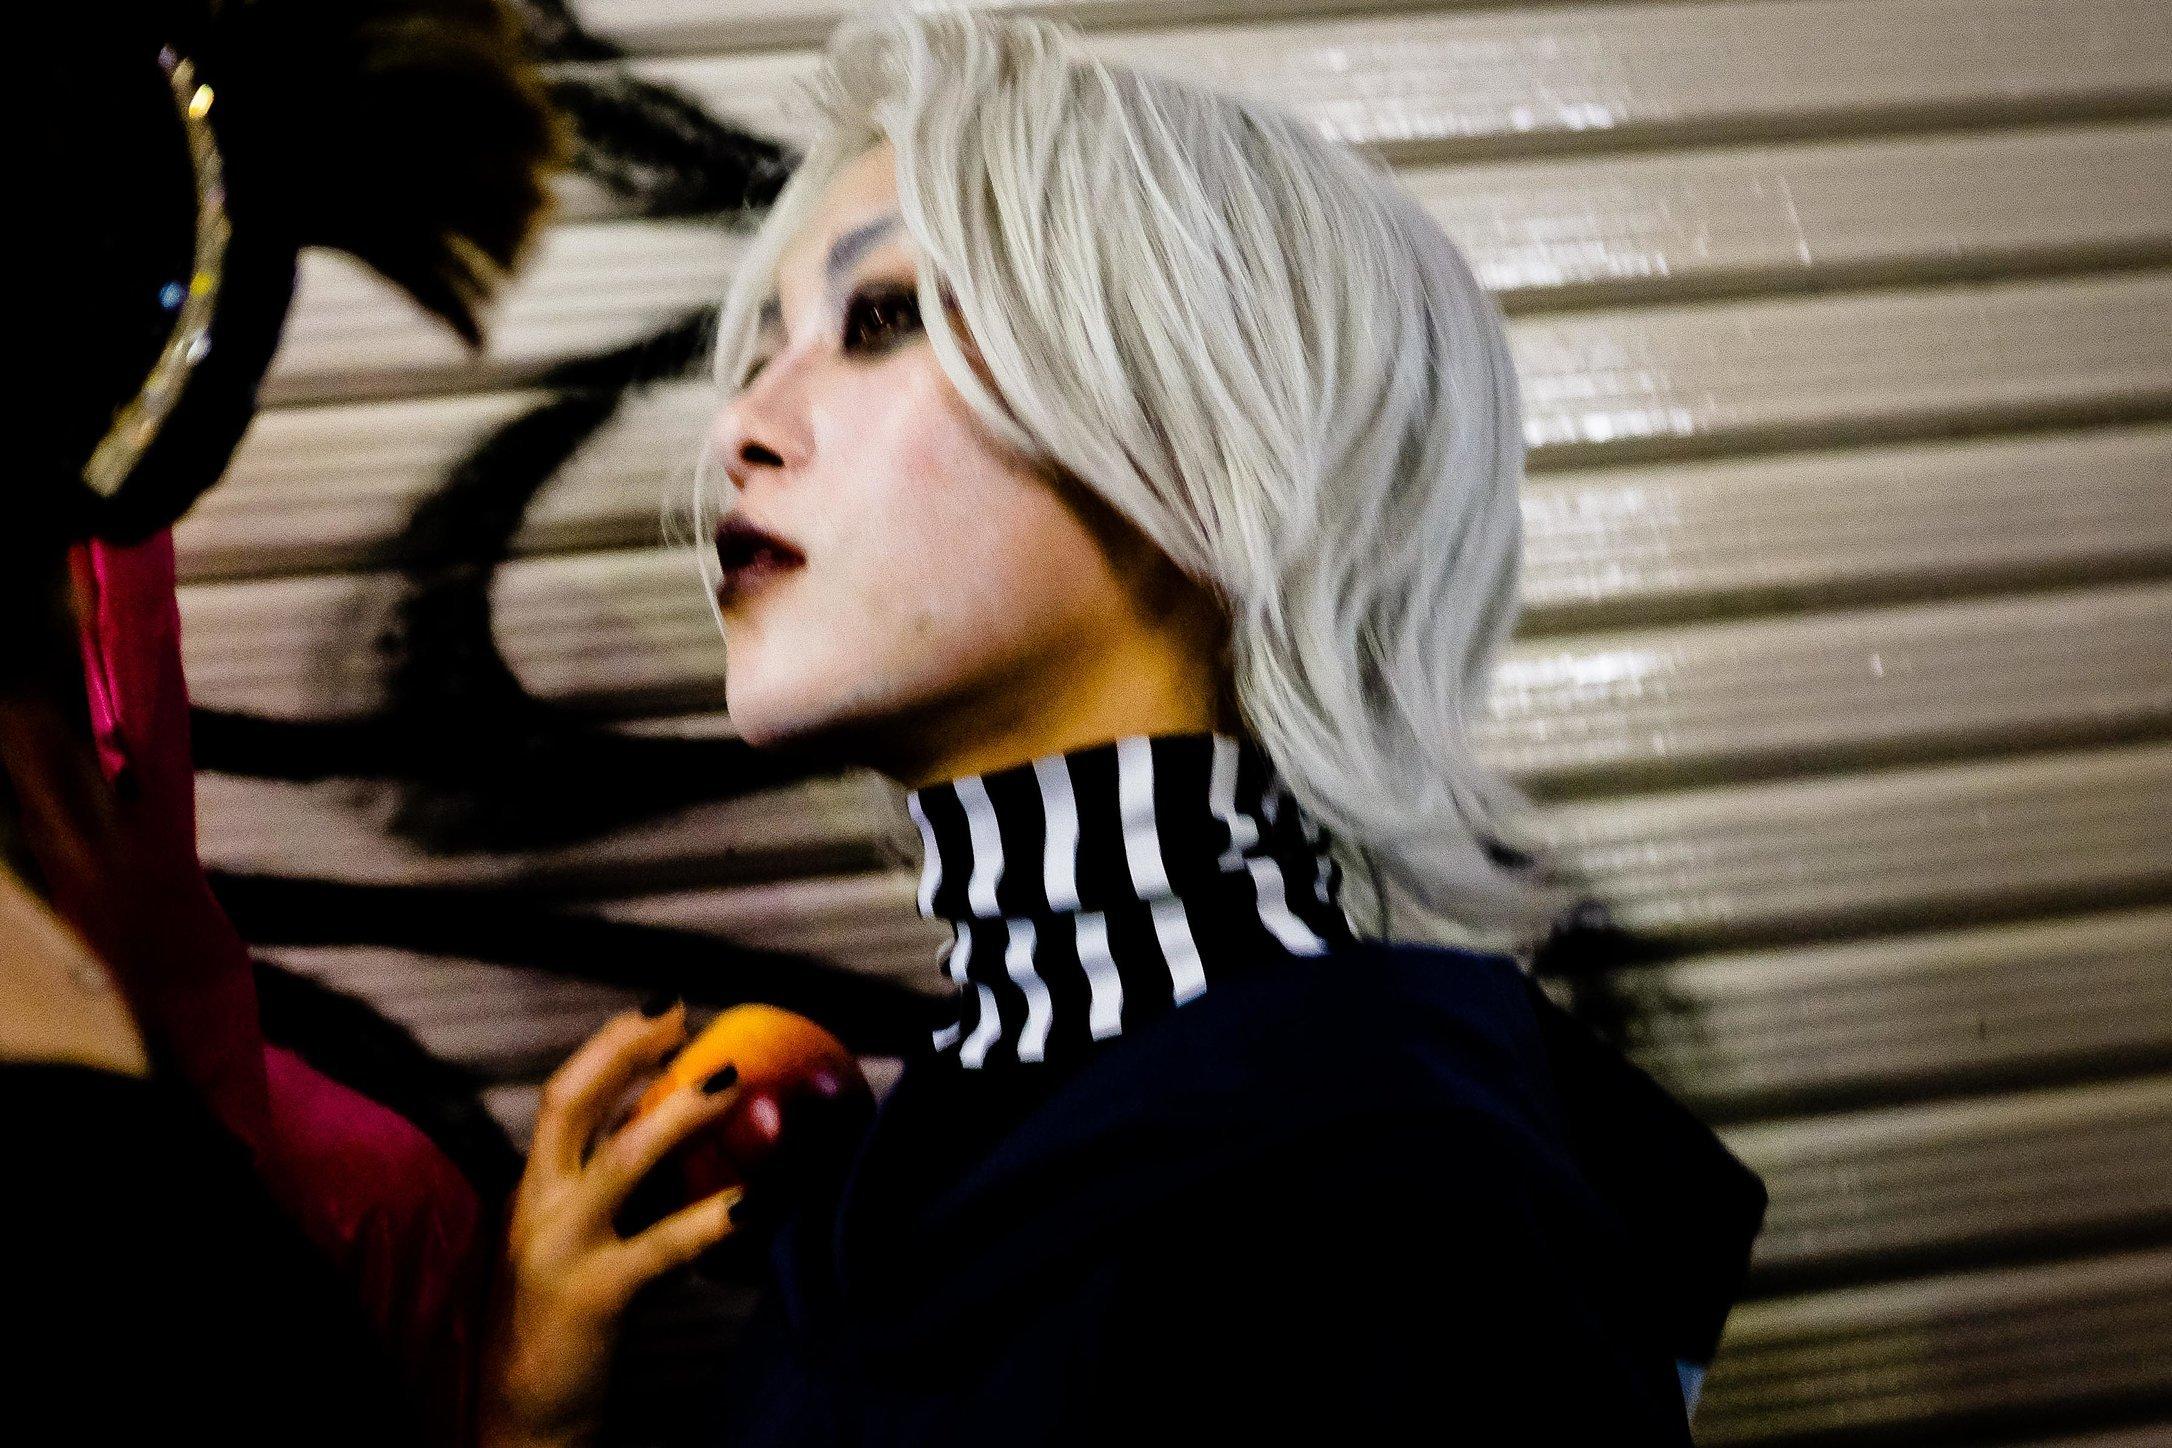 ShibuyaTimeWebsite-17.jpg